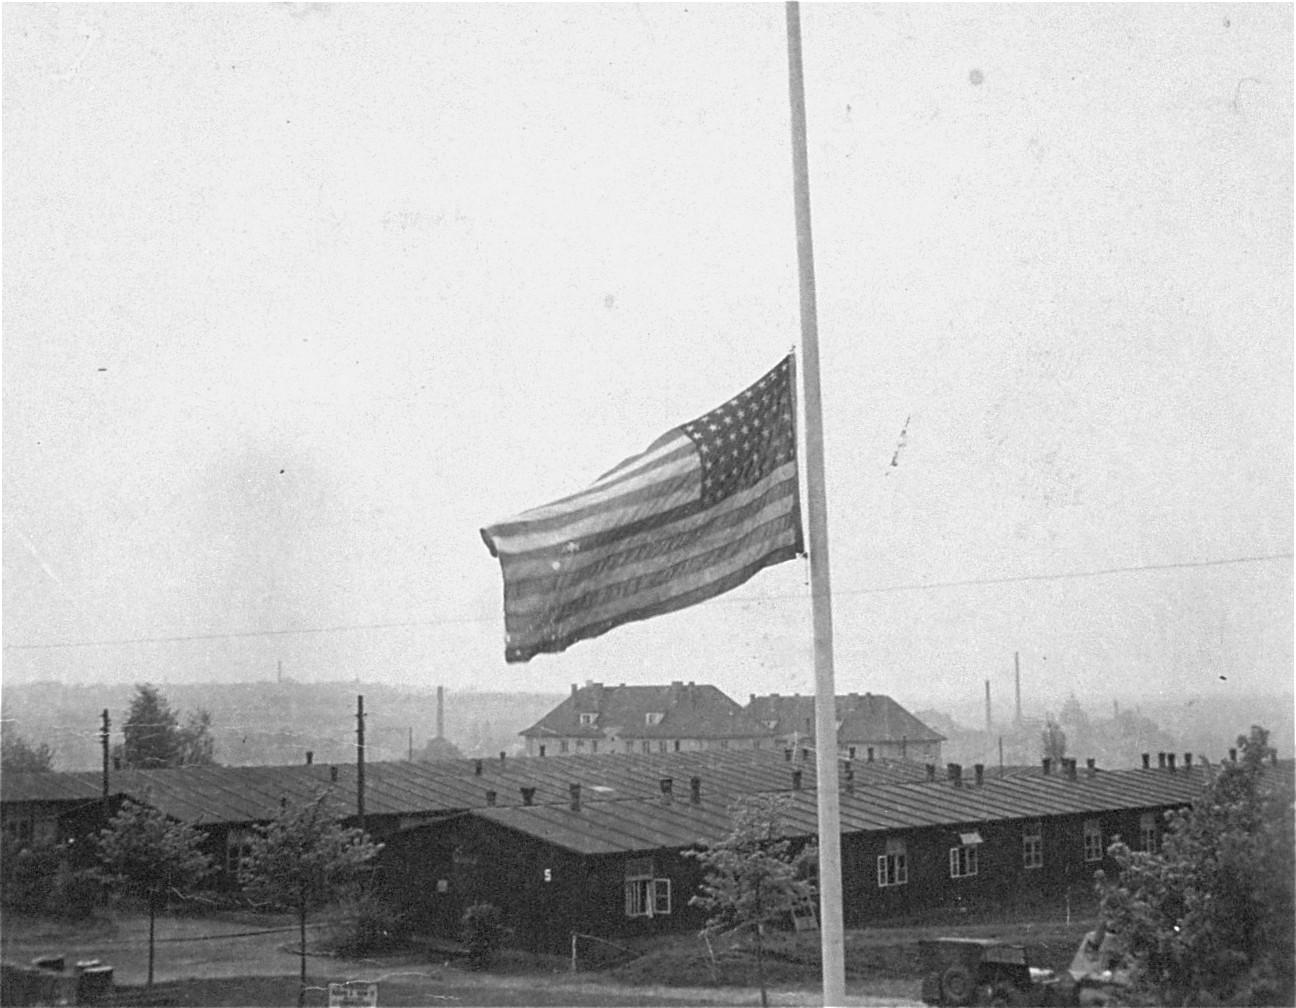 The American flag flying at half mast in Buchenwald.